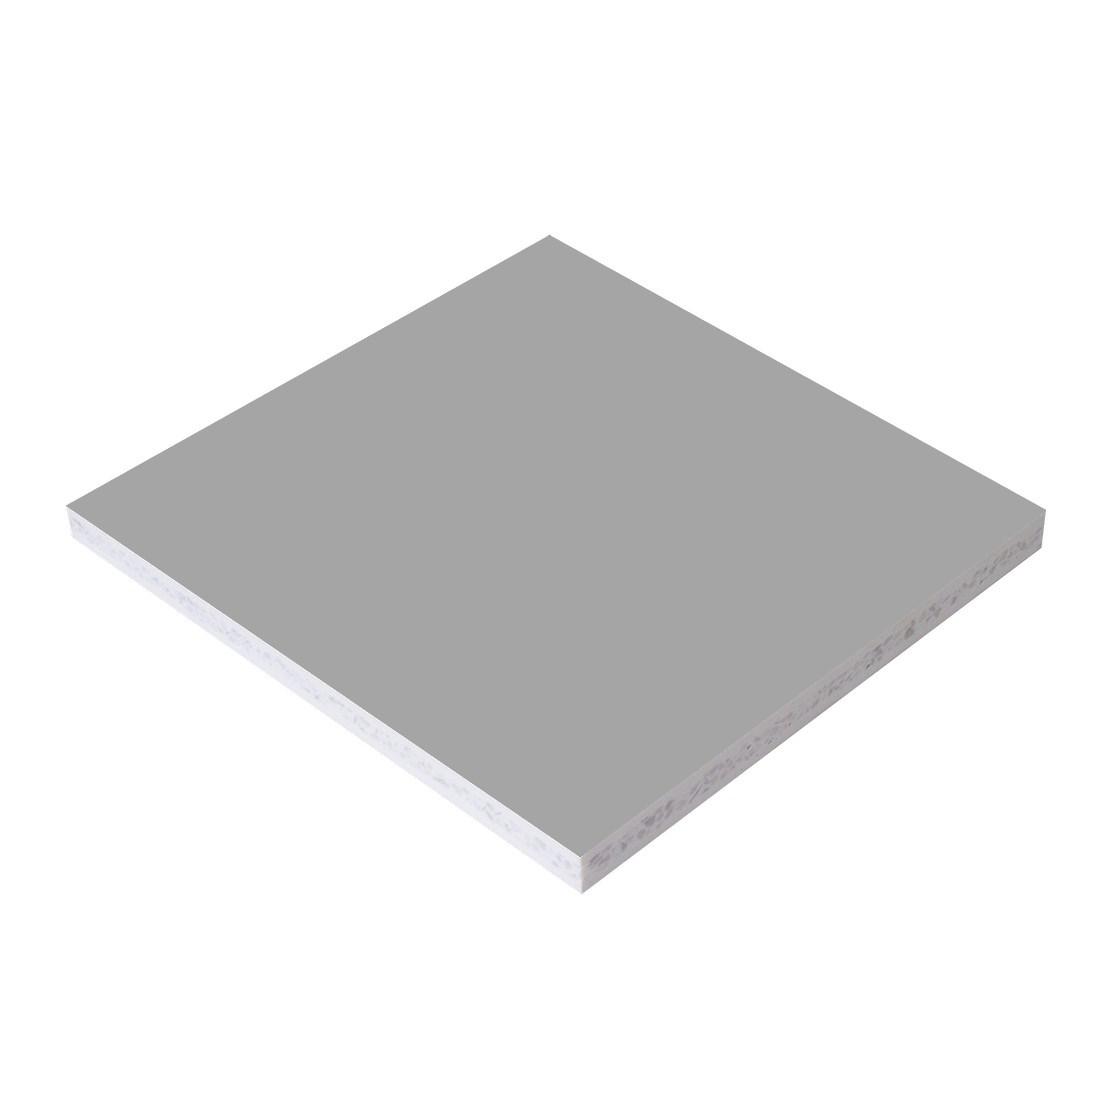 Steni Gevelplaat Colour Grijs Sn 8004 hm 4000-n 2995x1195x6mm